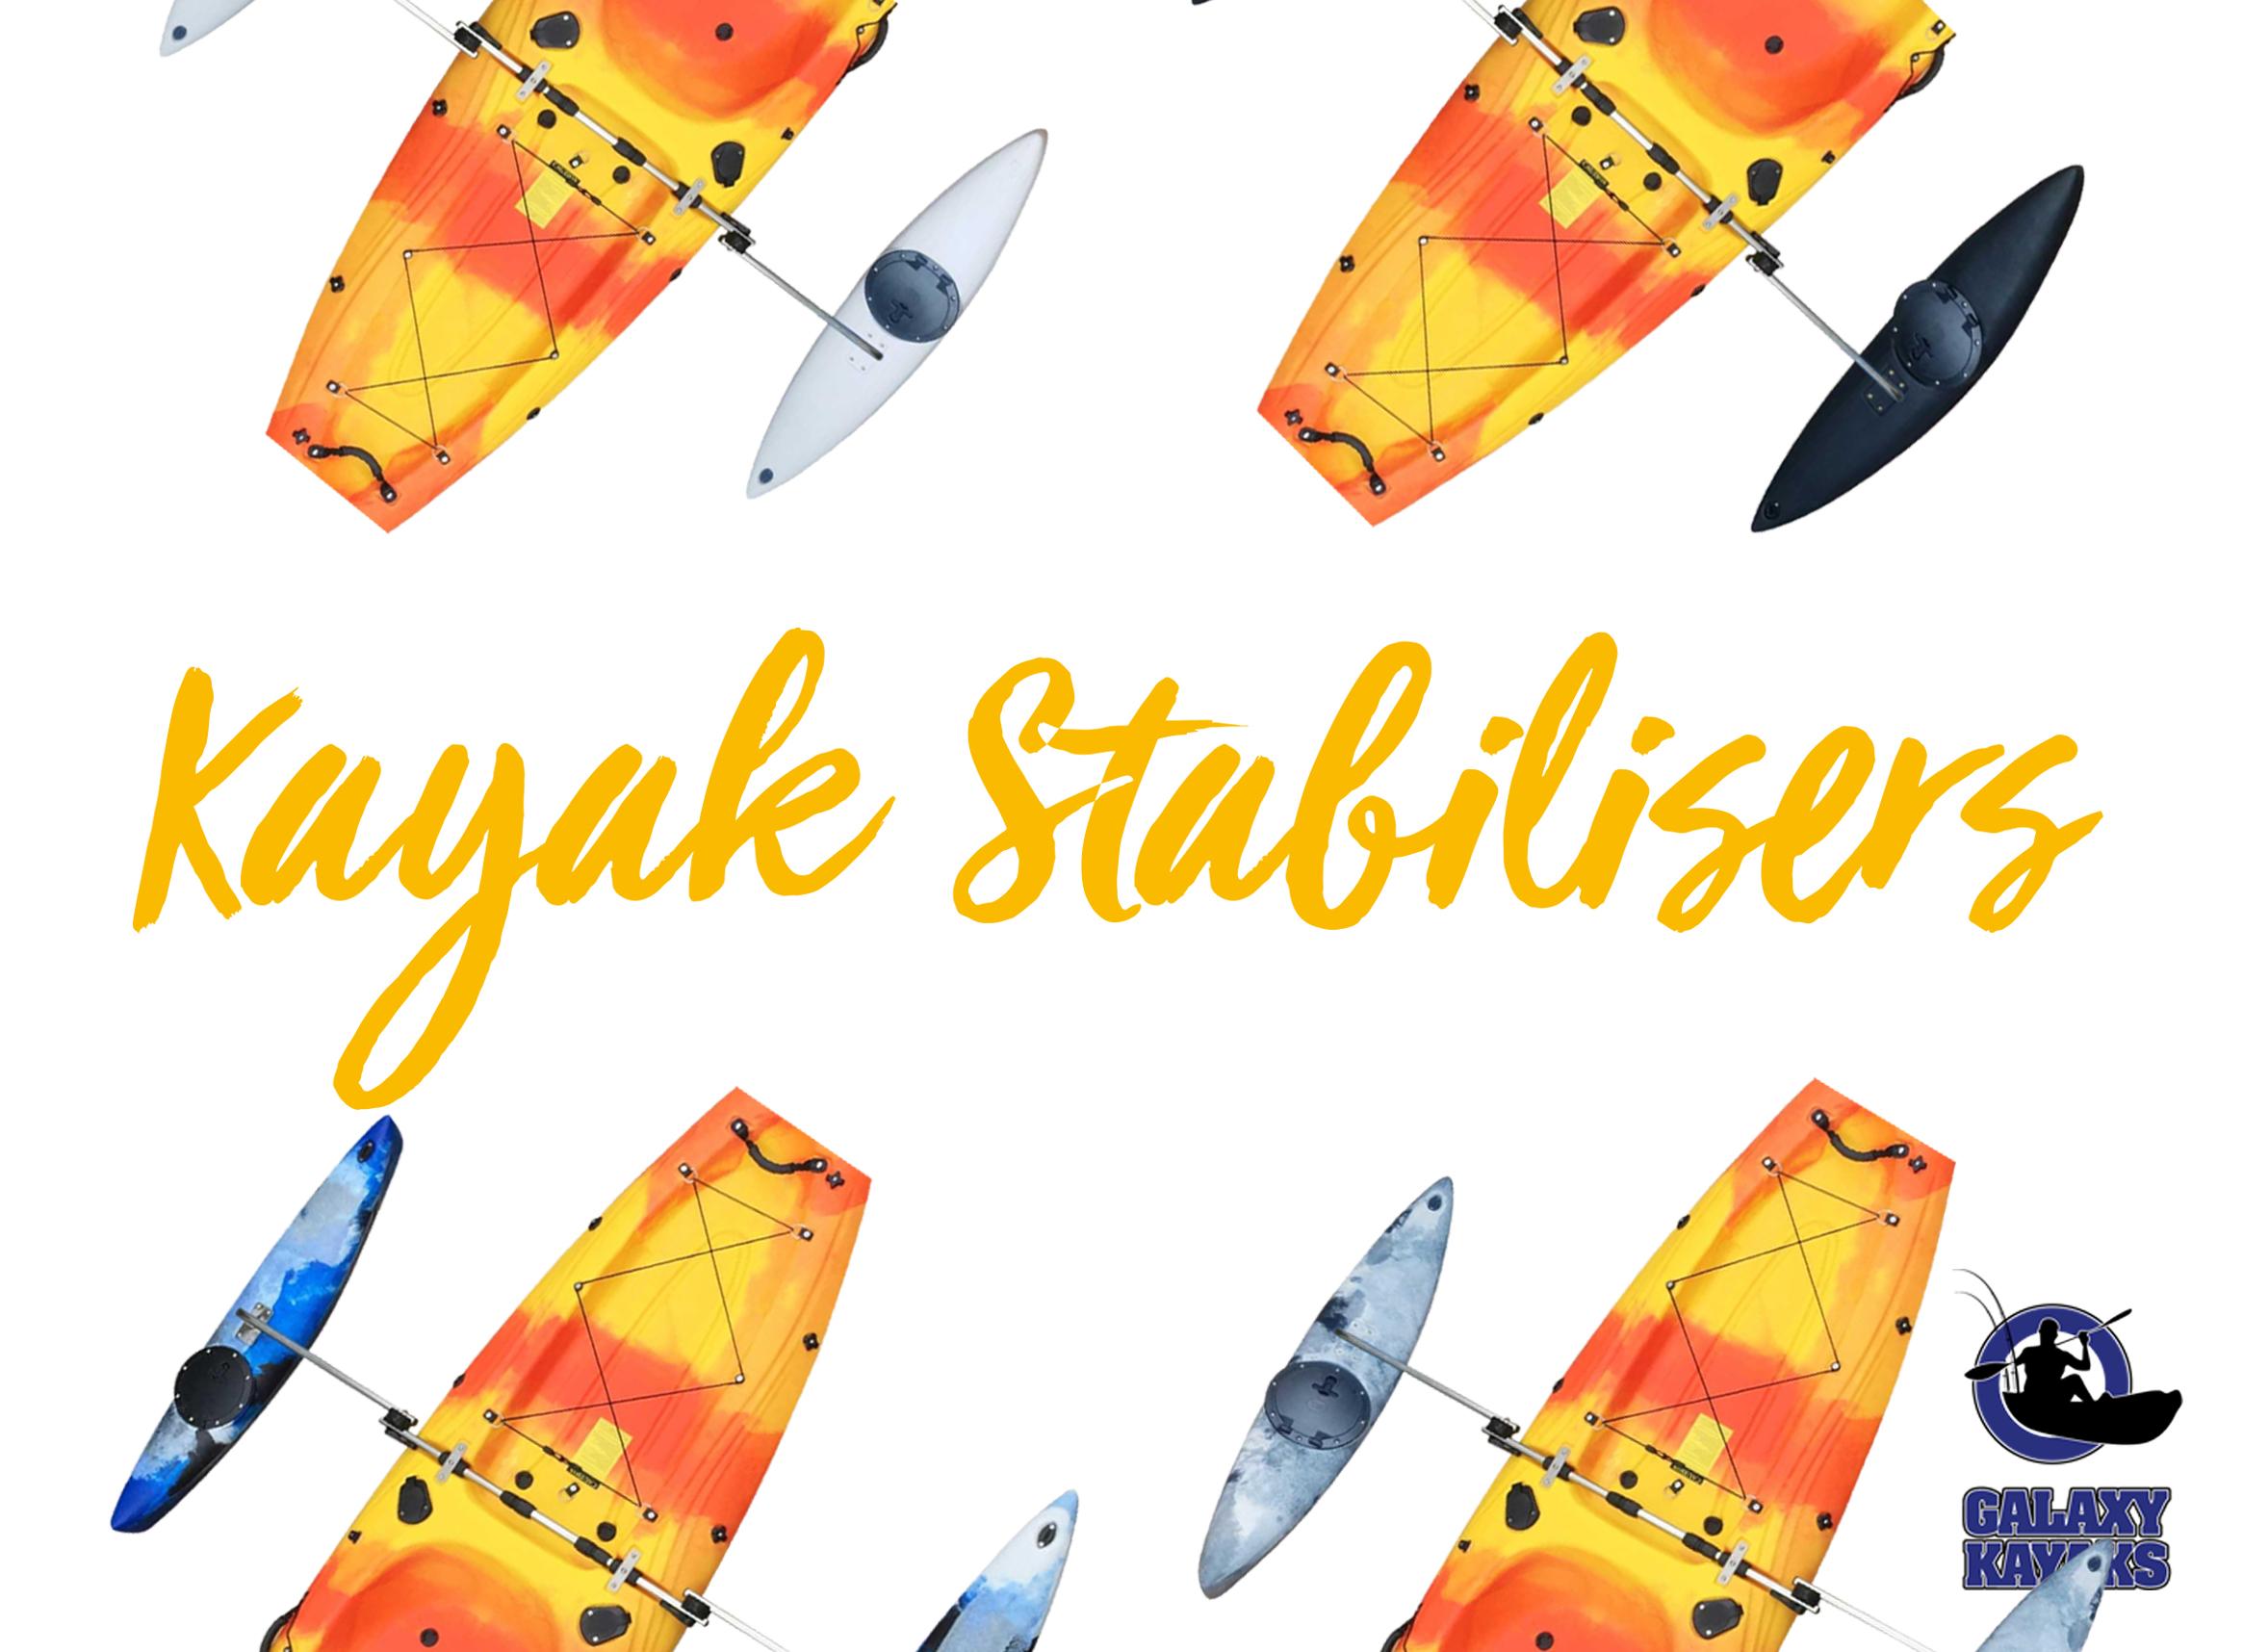 Kayak Stabilisers